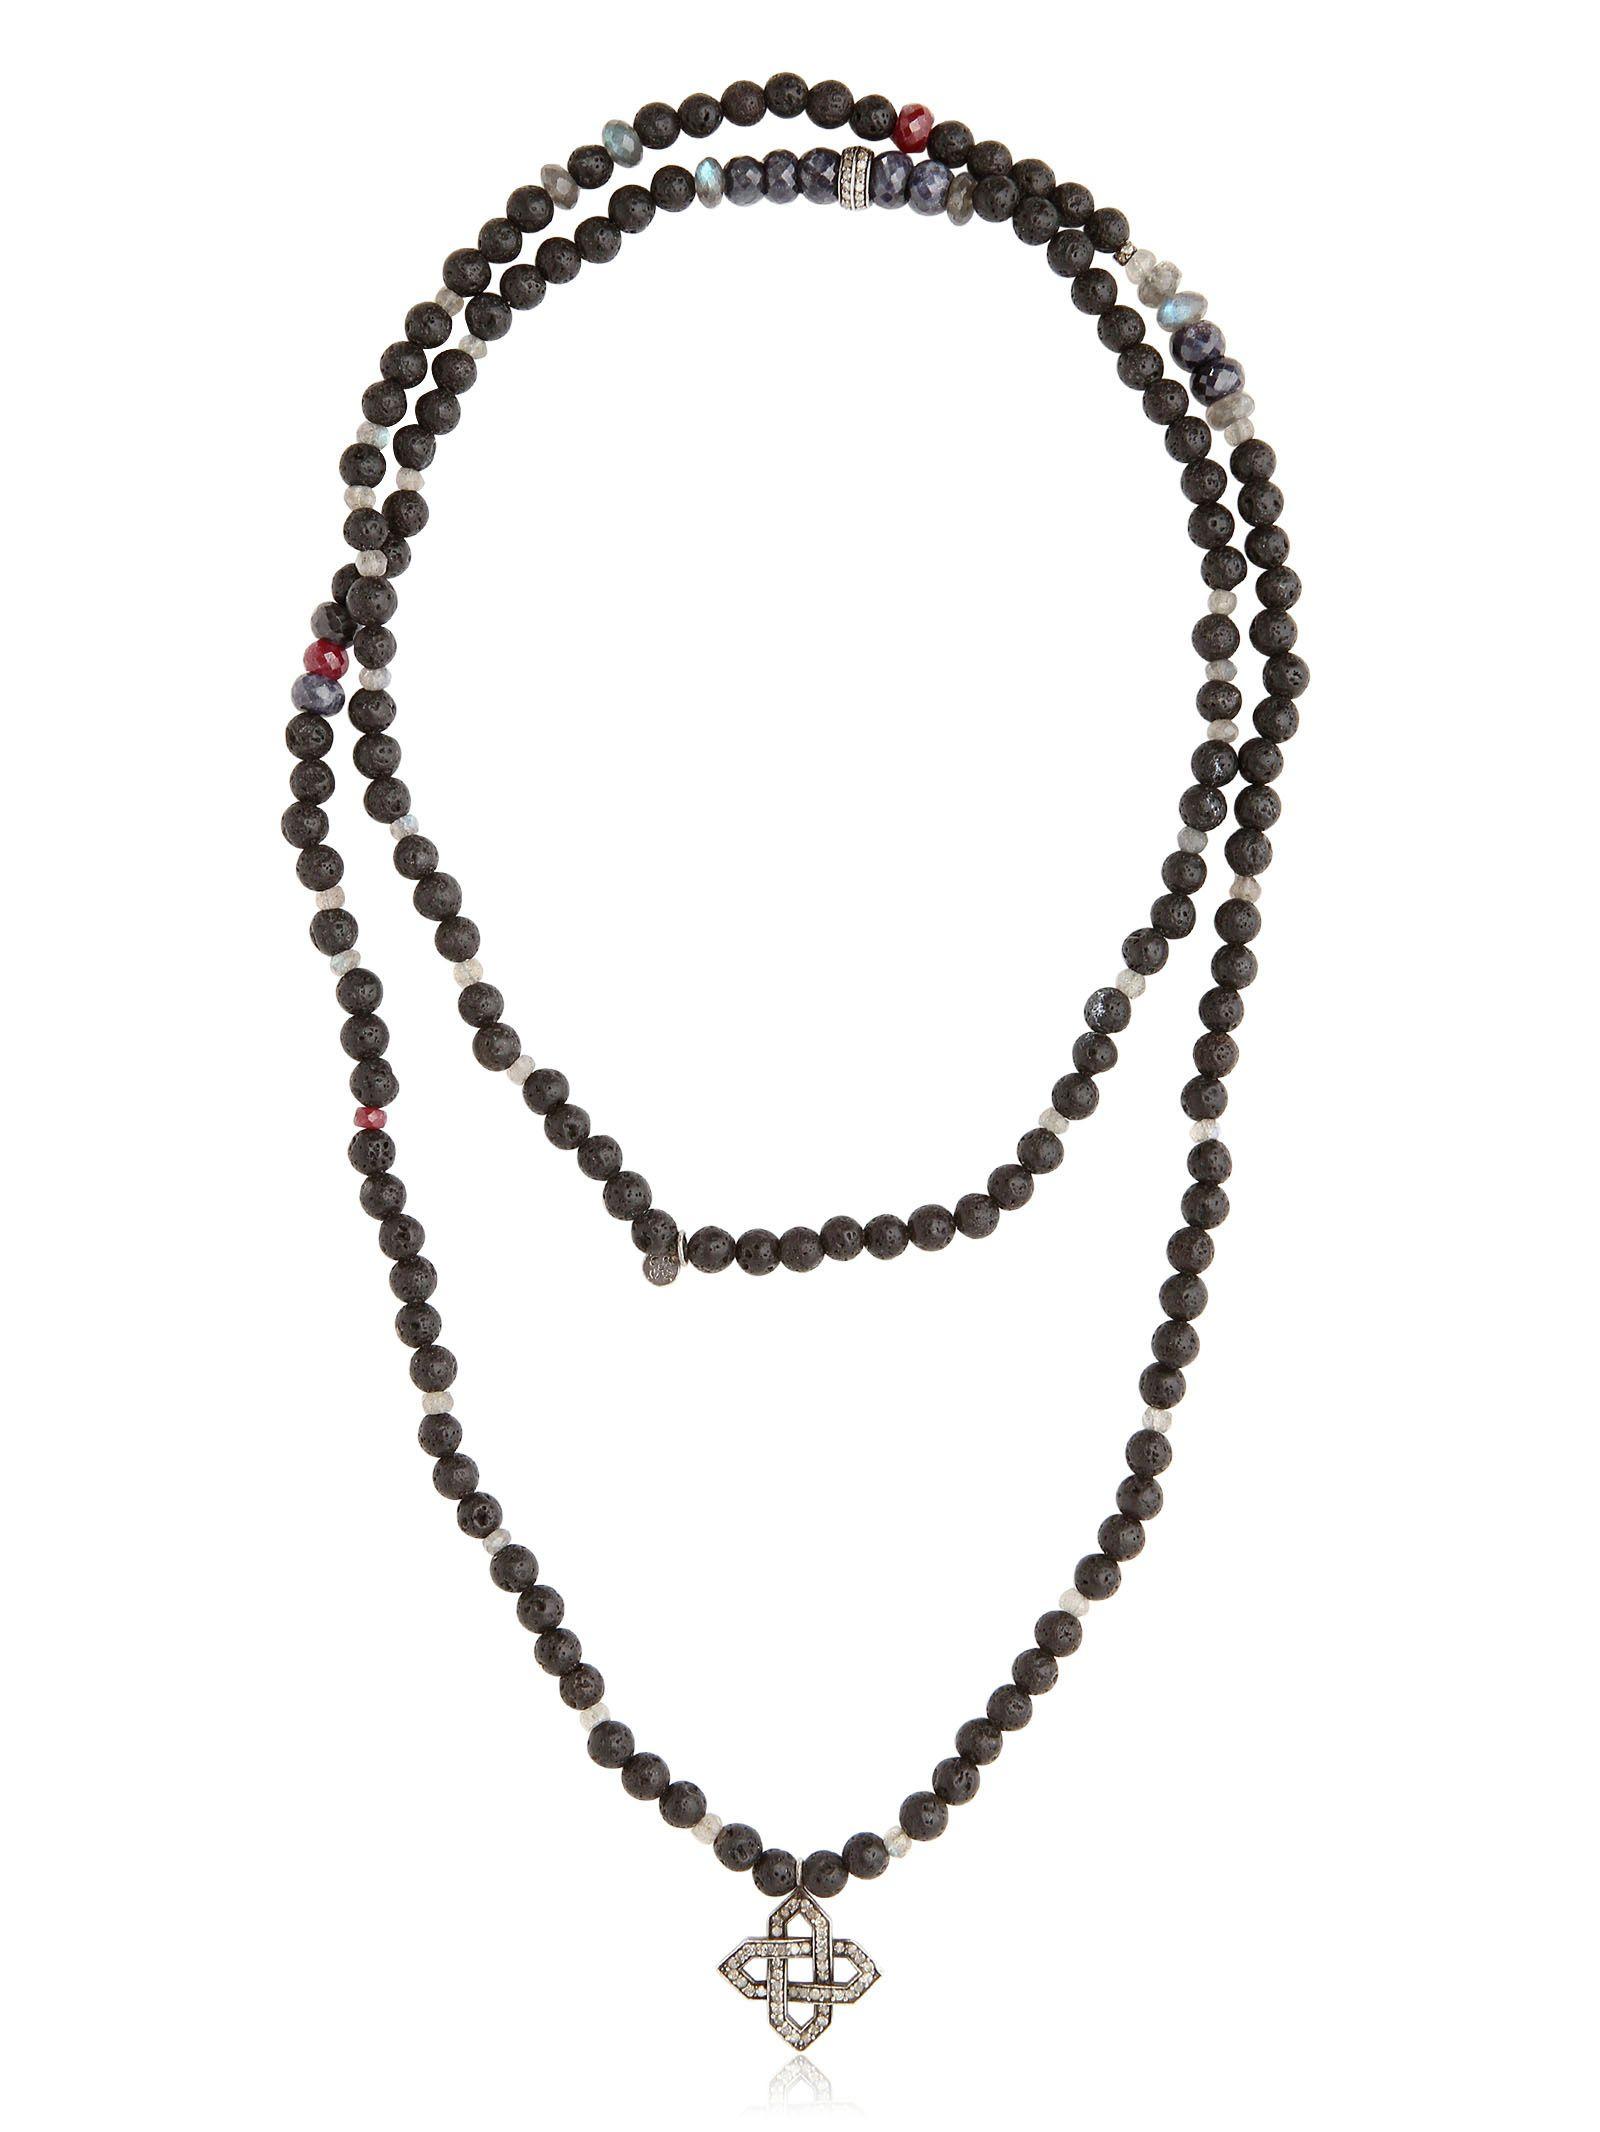 Ocnarf sairutsa Ruby Sapphire Diamond Lava Necklace in Black for Men